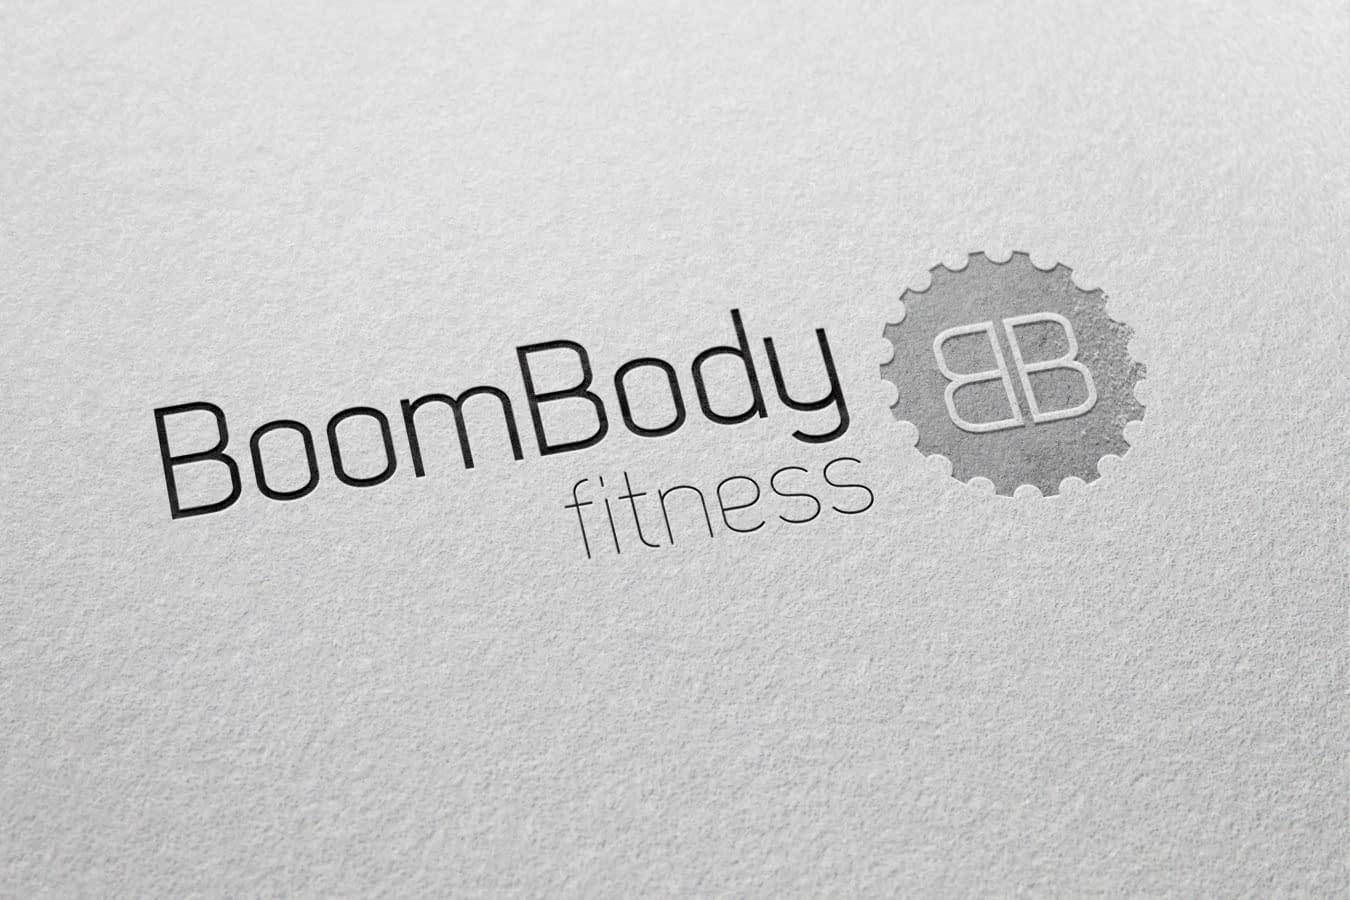 logos_boombody5